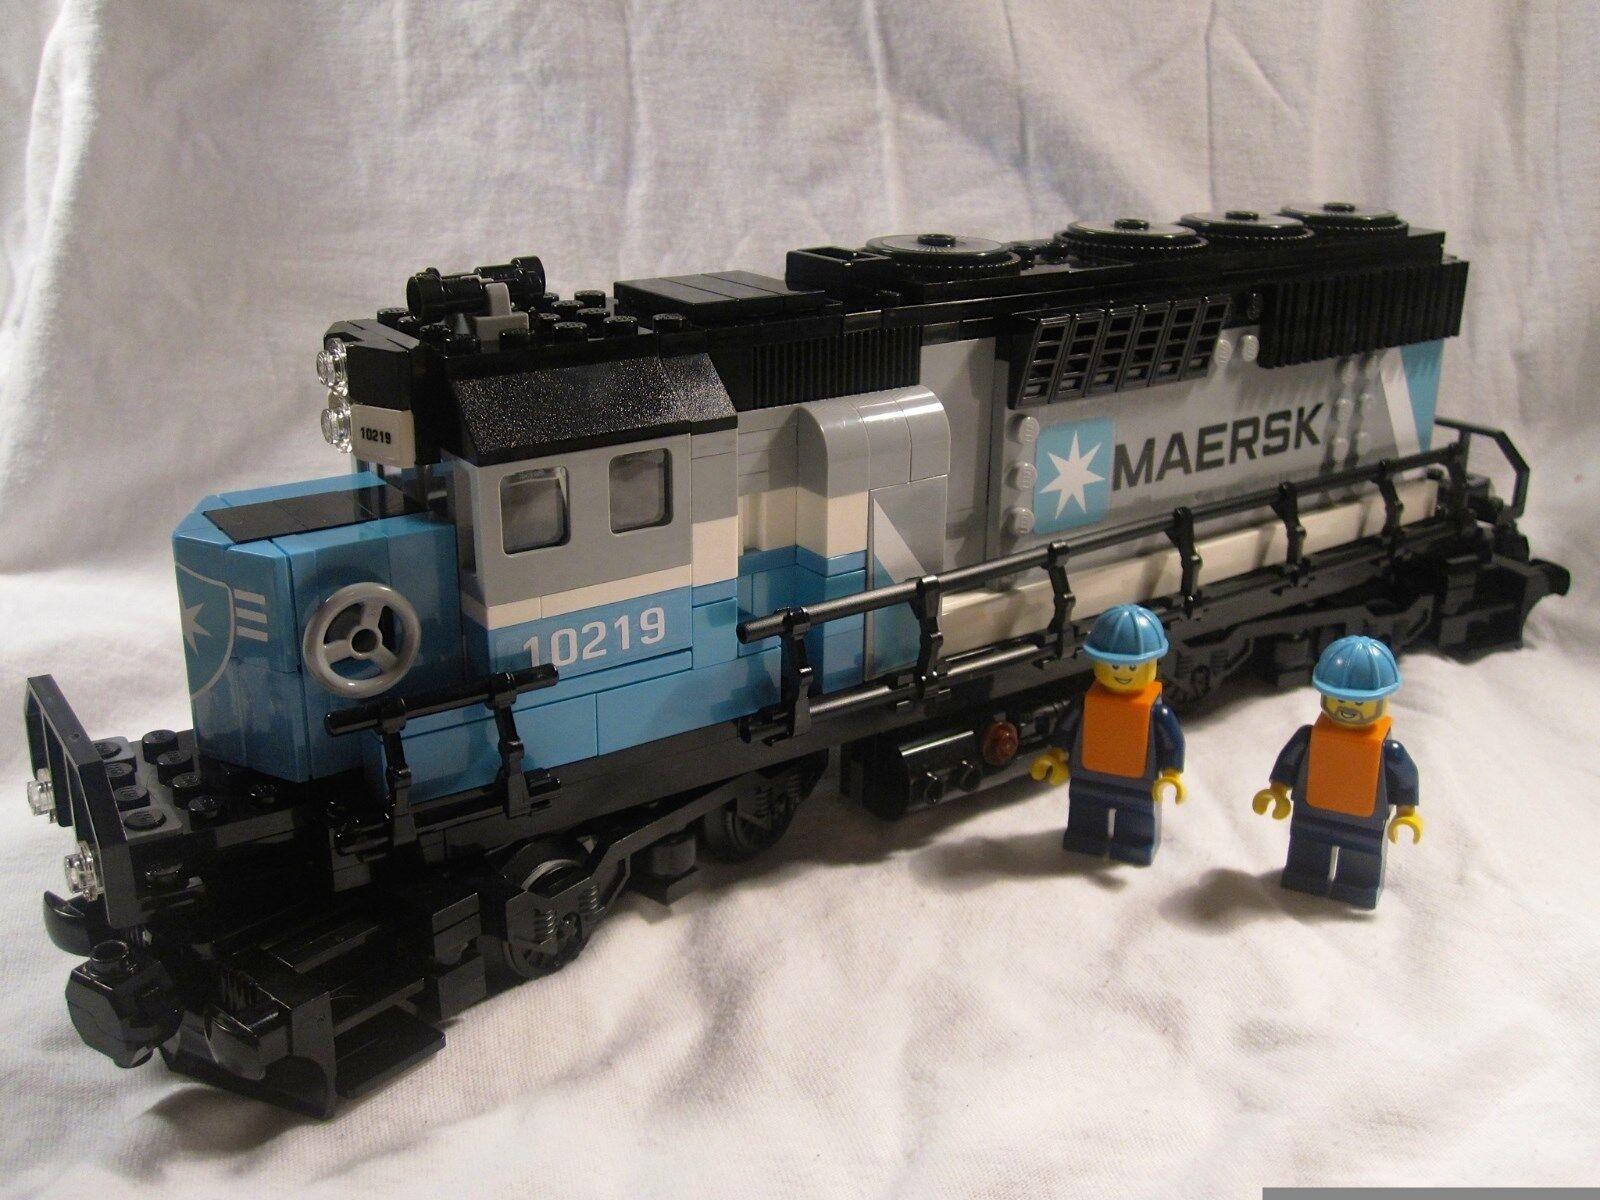 LEGO Train City Creator Maersk moteur diesel Comme neuf 10219 10194 10233